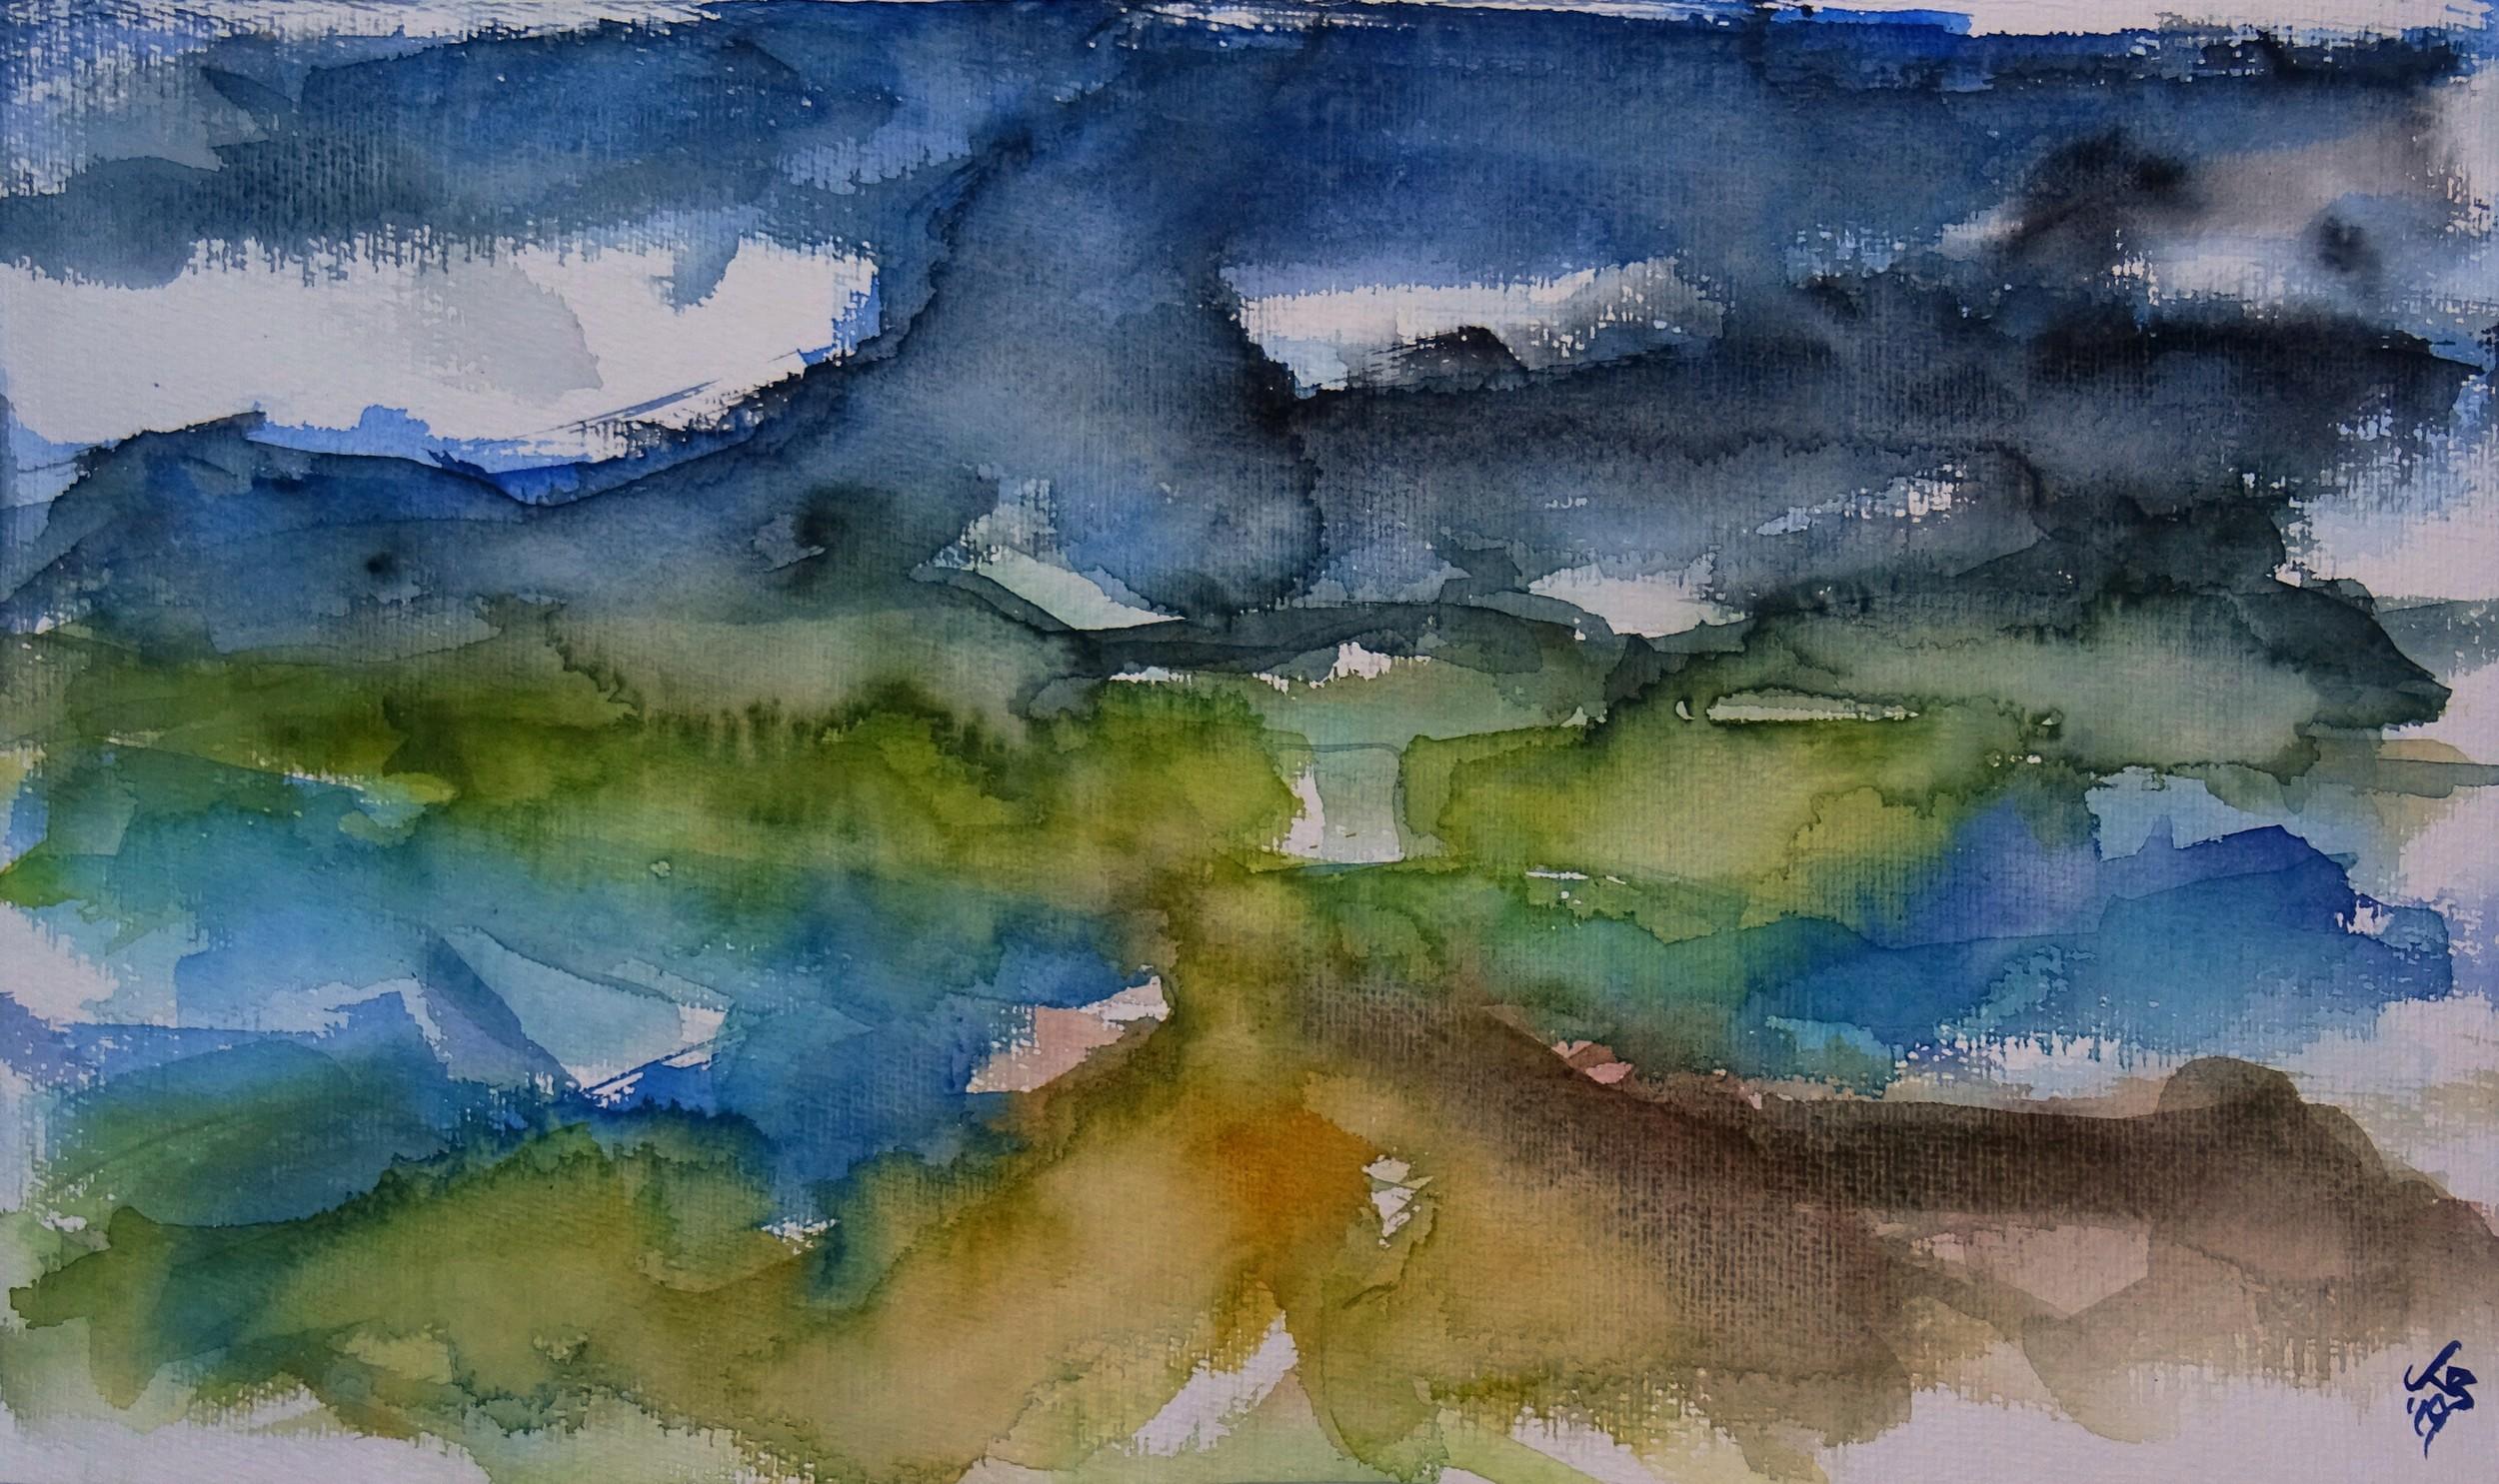 19-01-03_outer_hebrides_barra_traigh_mhòr_Watercolour_50_x_30_cm_©2019_by_Klaus_Bölling.jpg